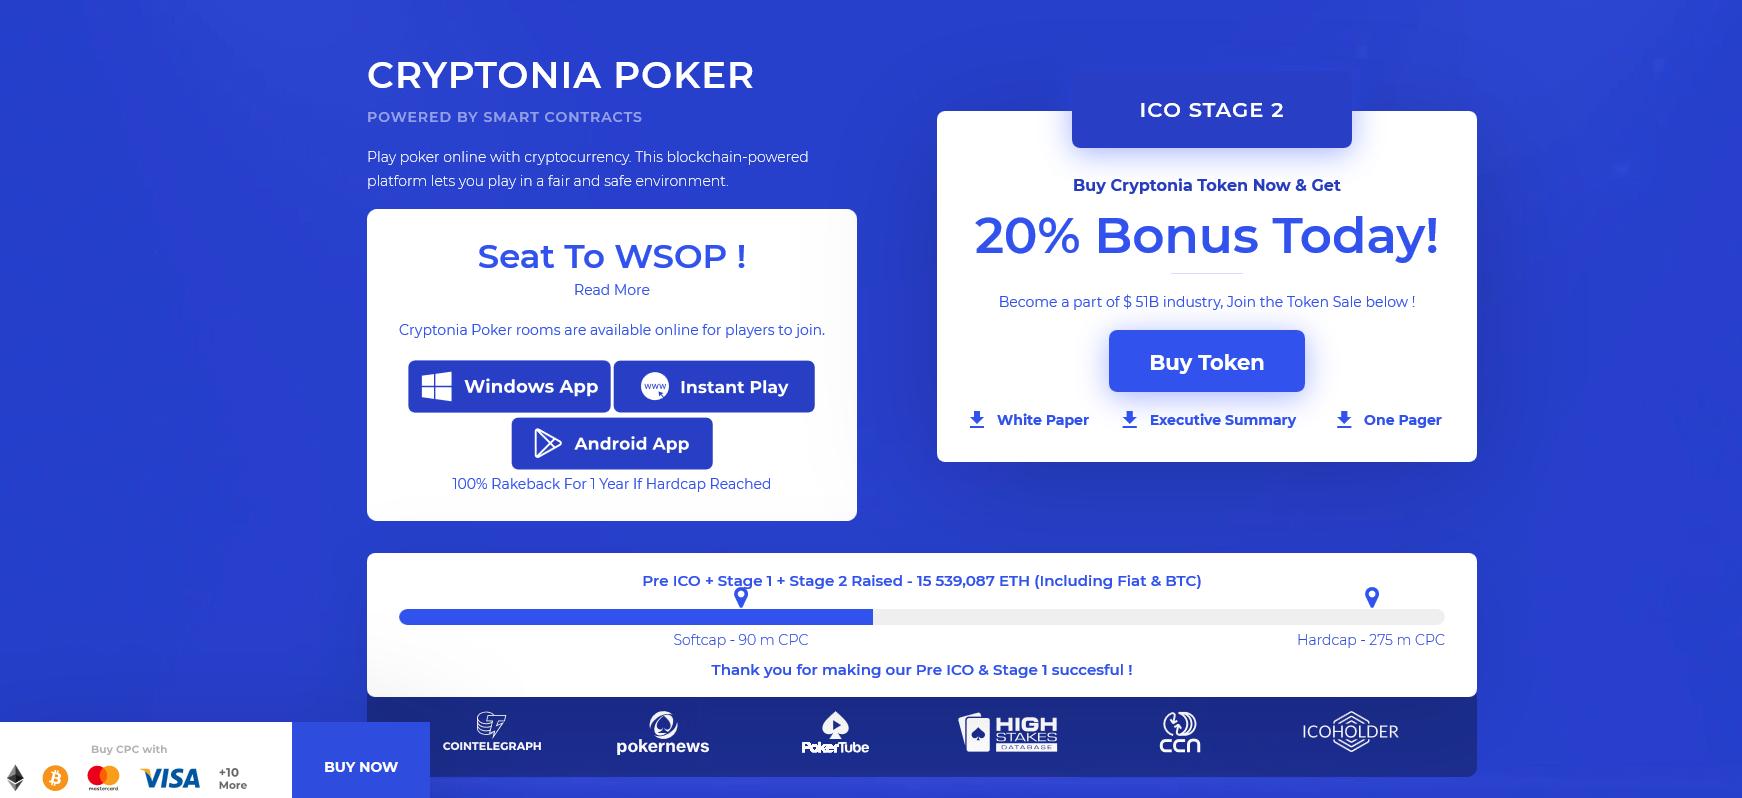 Screenshot-2018-6-21 Cryptonia Poker.png